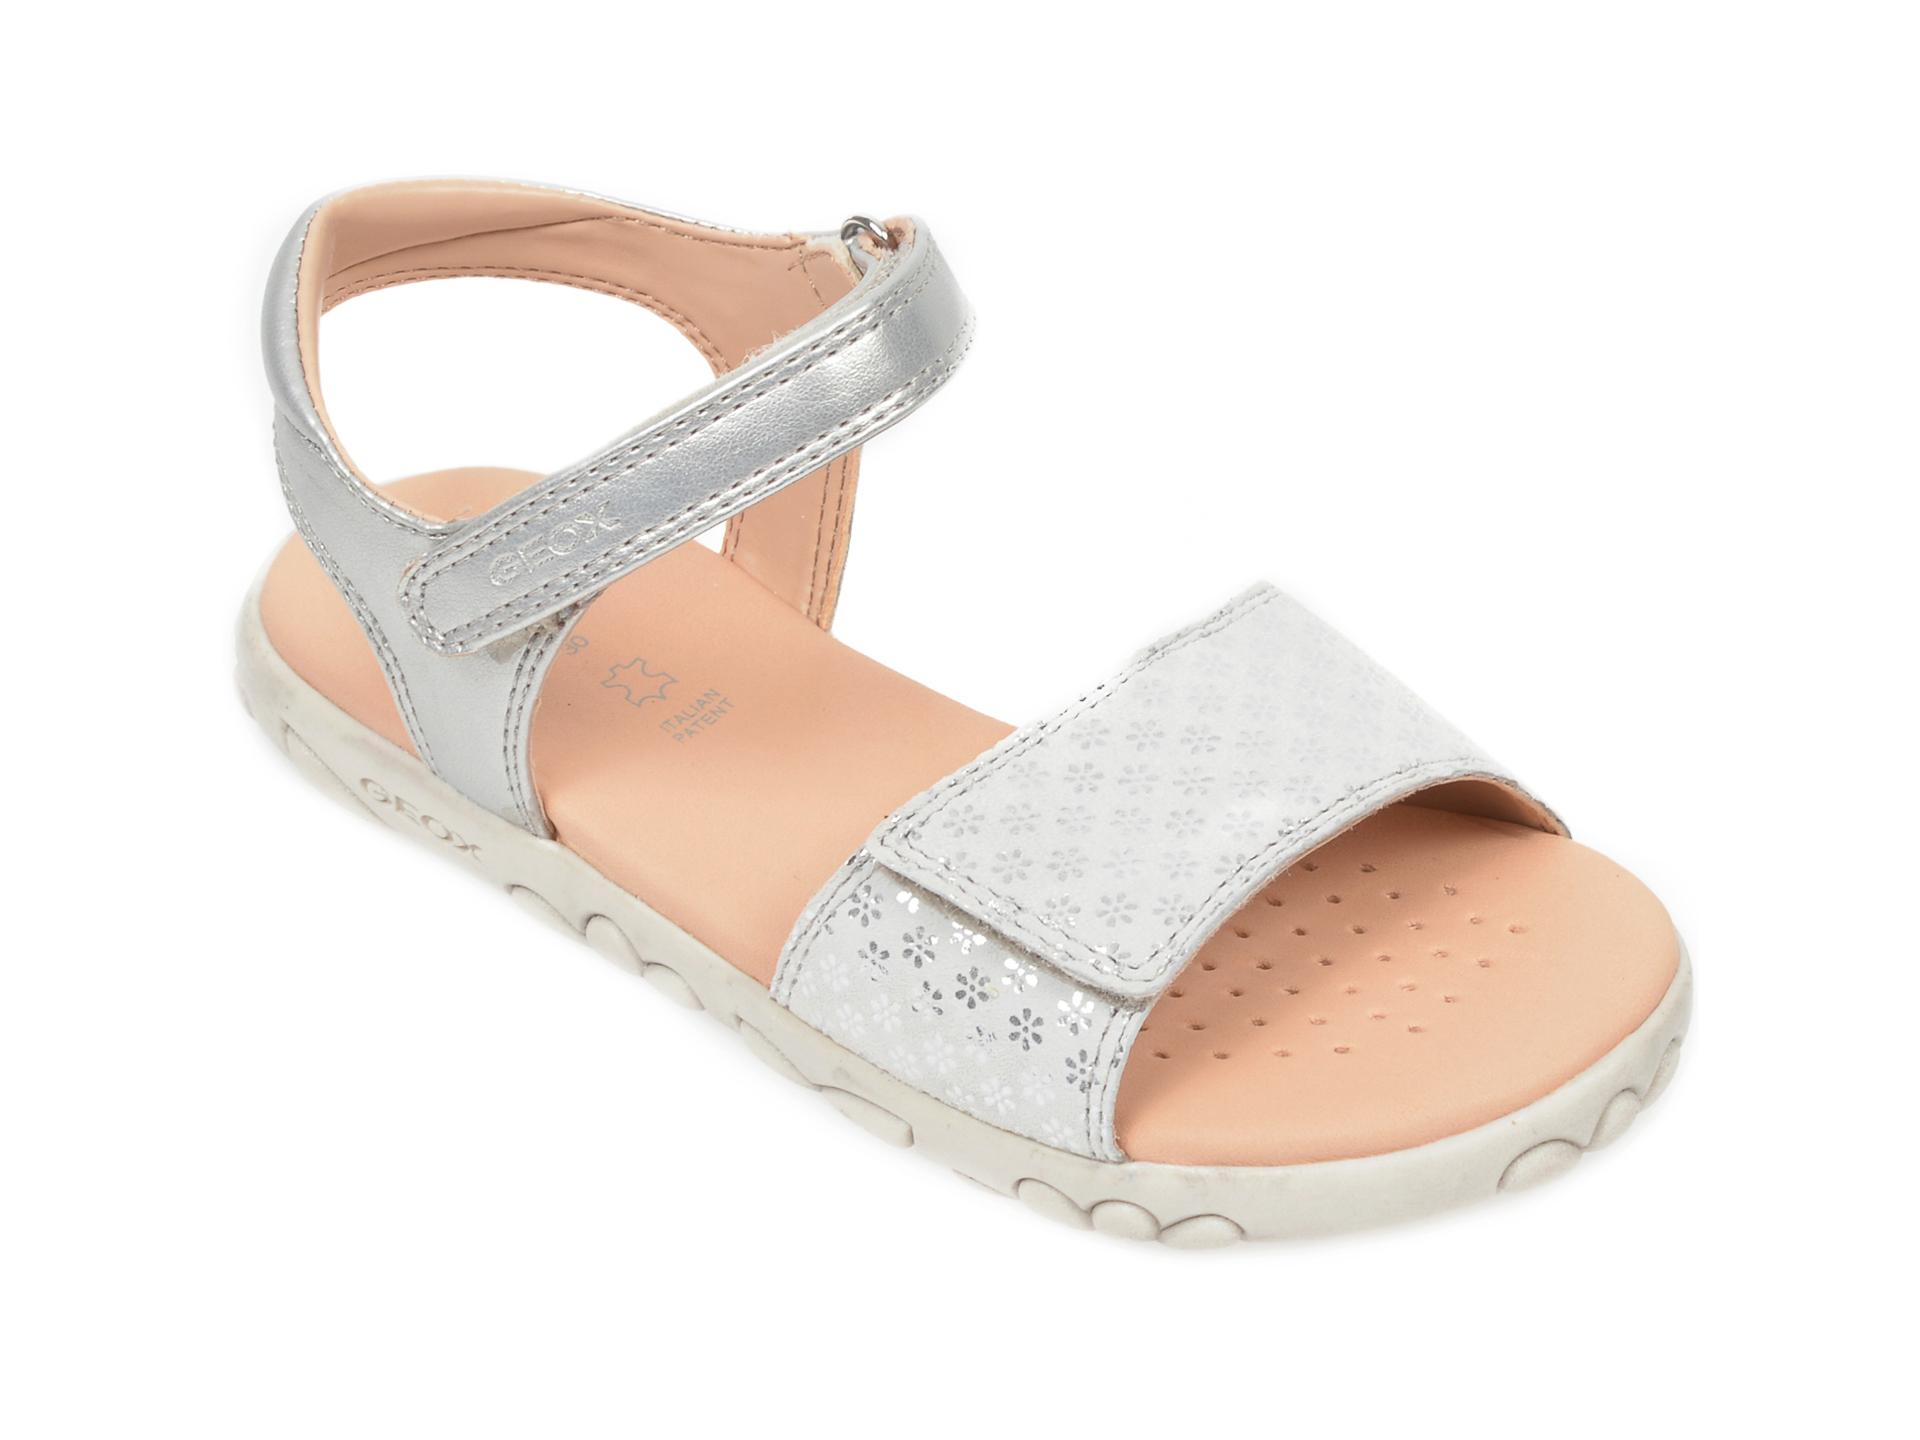 Sandale GEOX argintii, J028ZA, din piele naturala